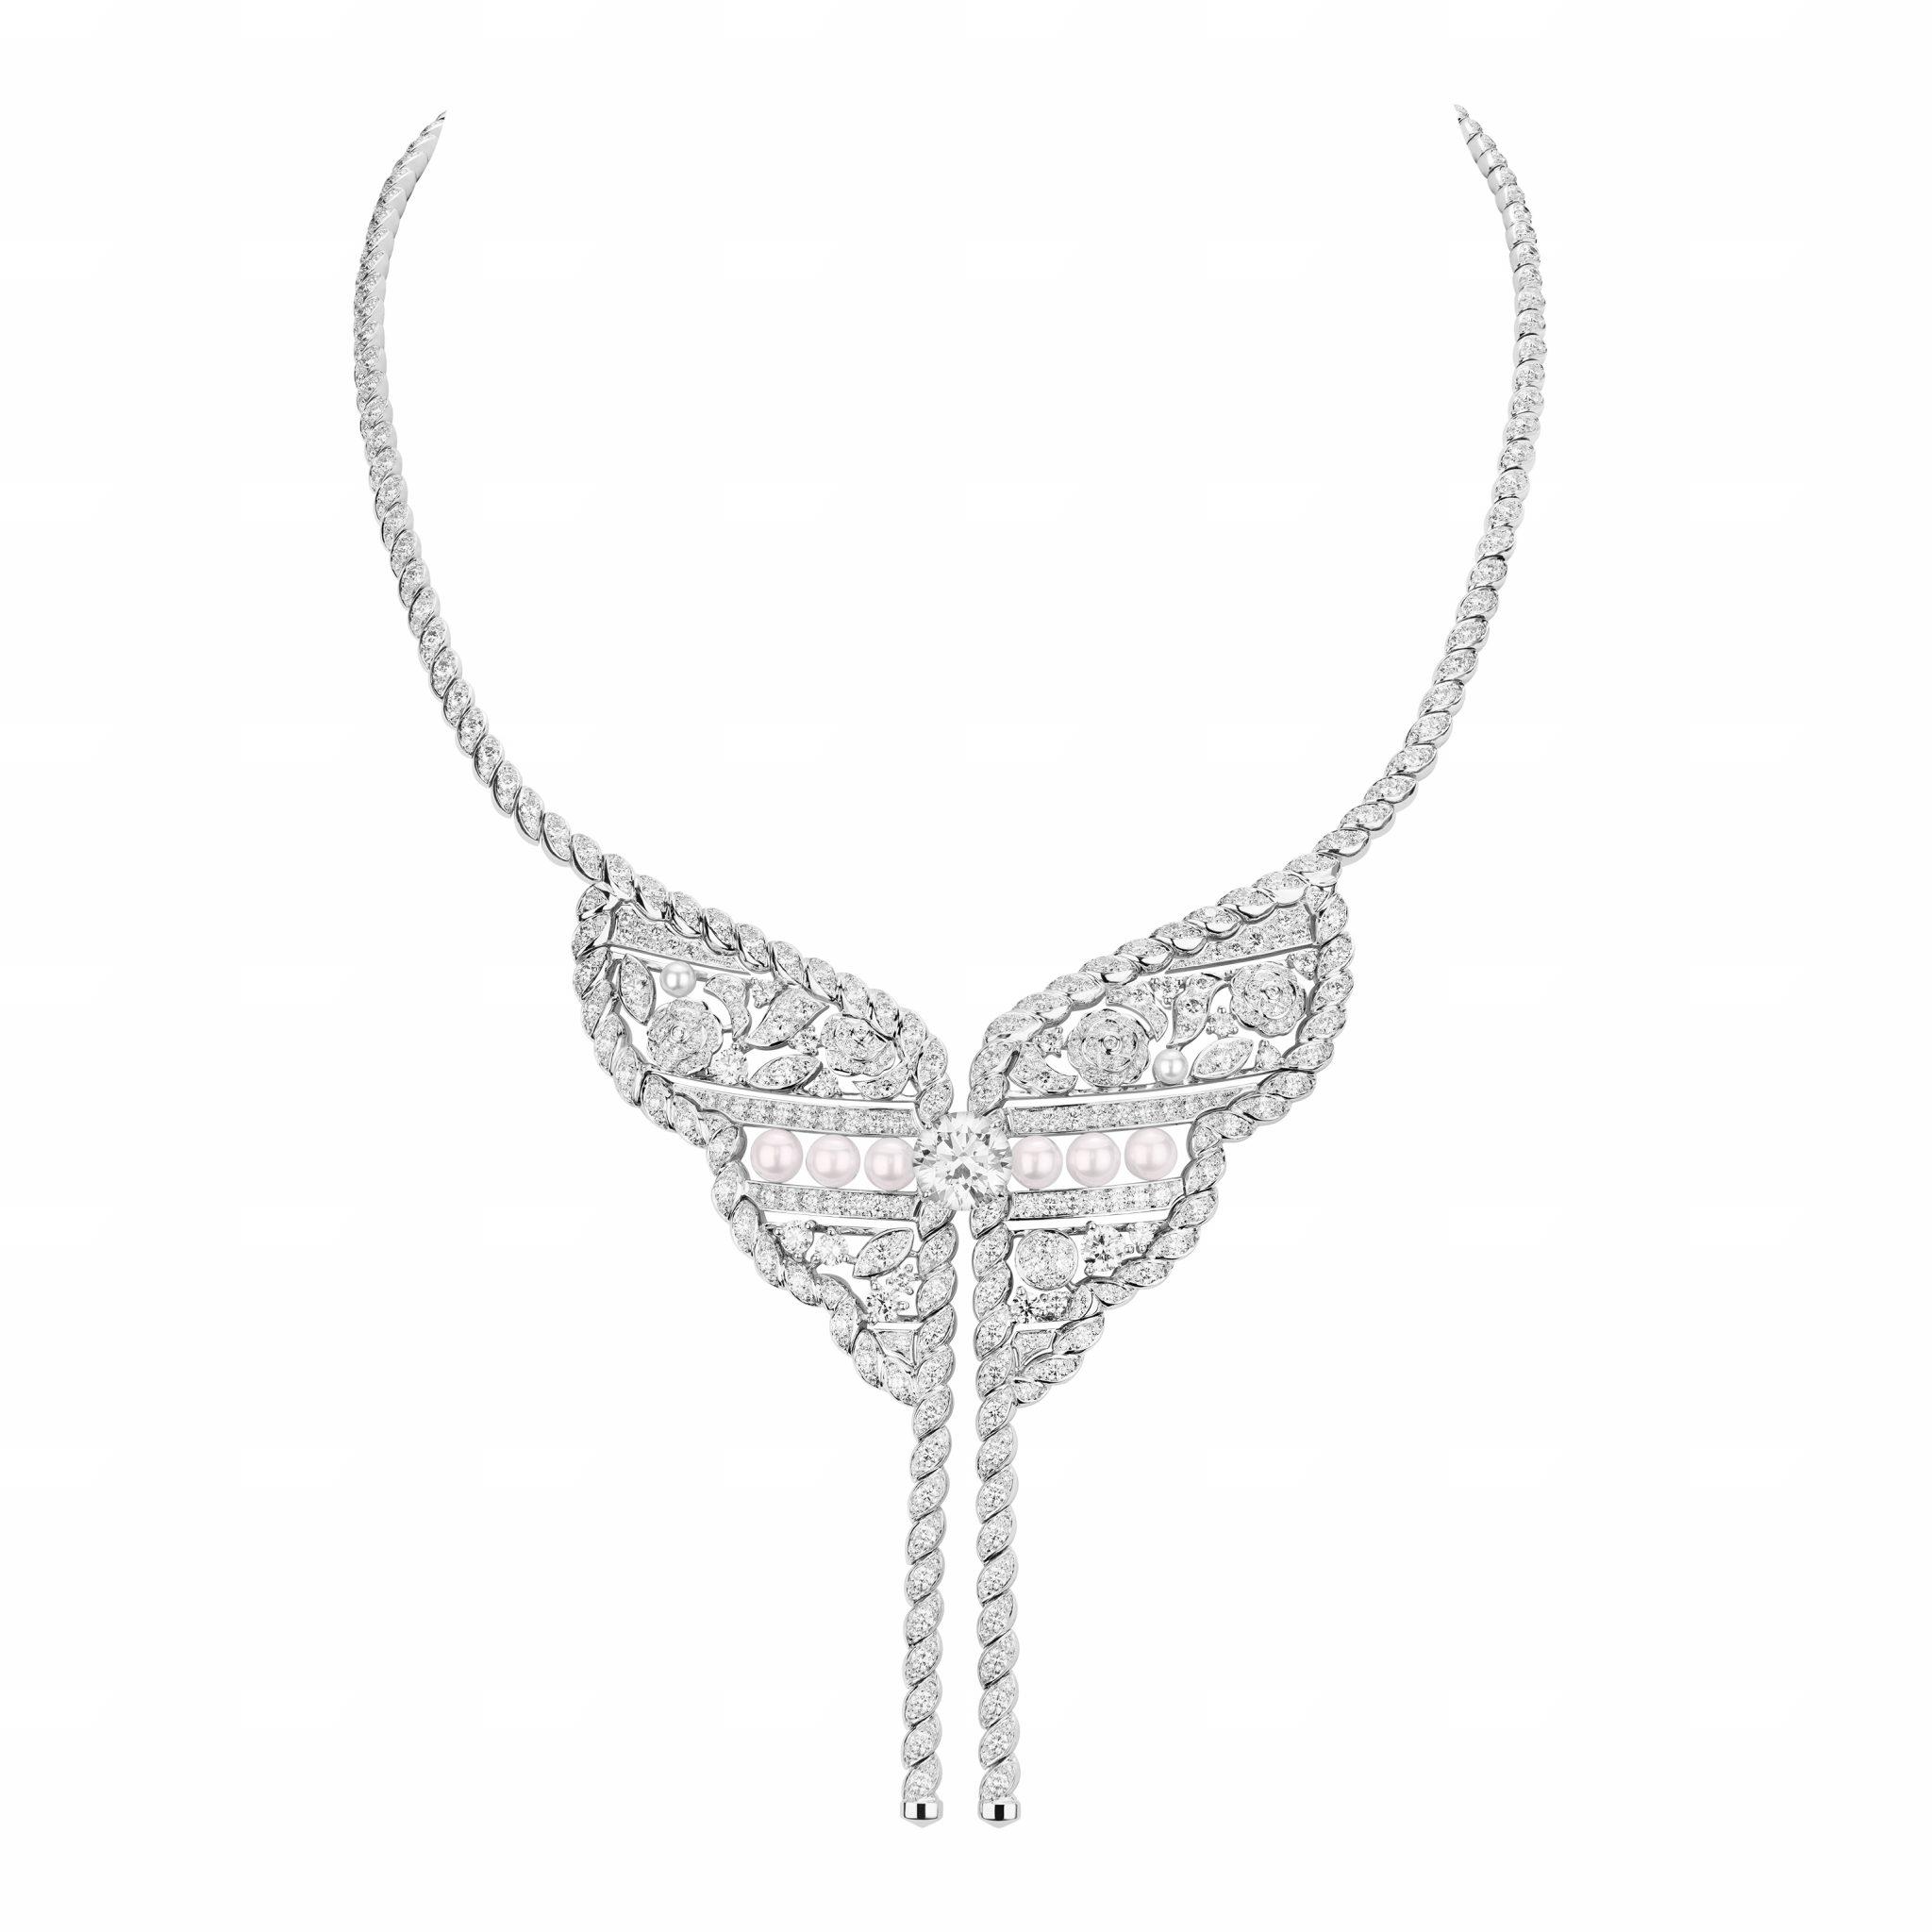 Roubachka CHANEL collier Esprit de Gabrielle espritdegabrielle.com